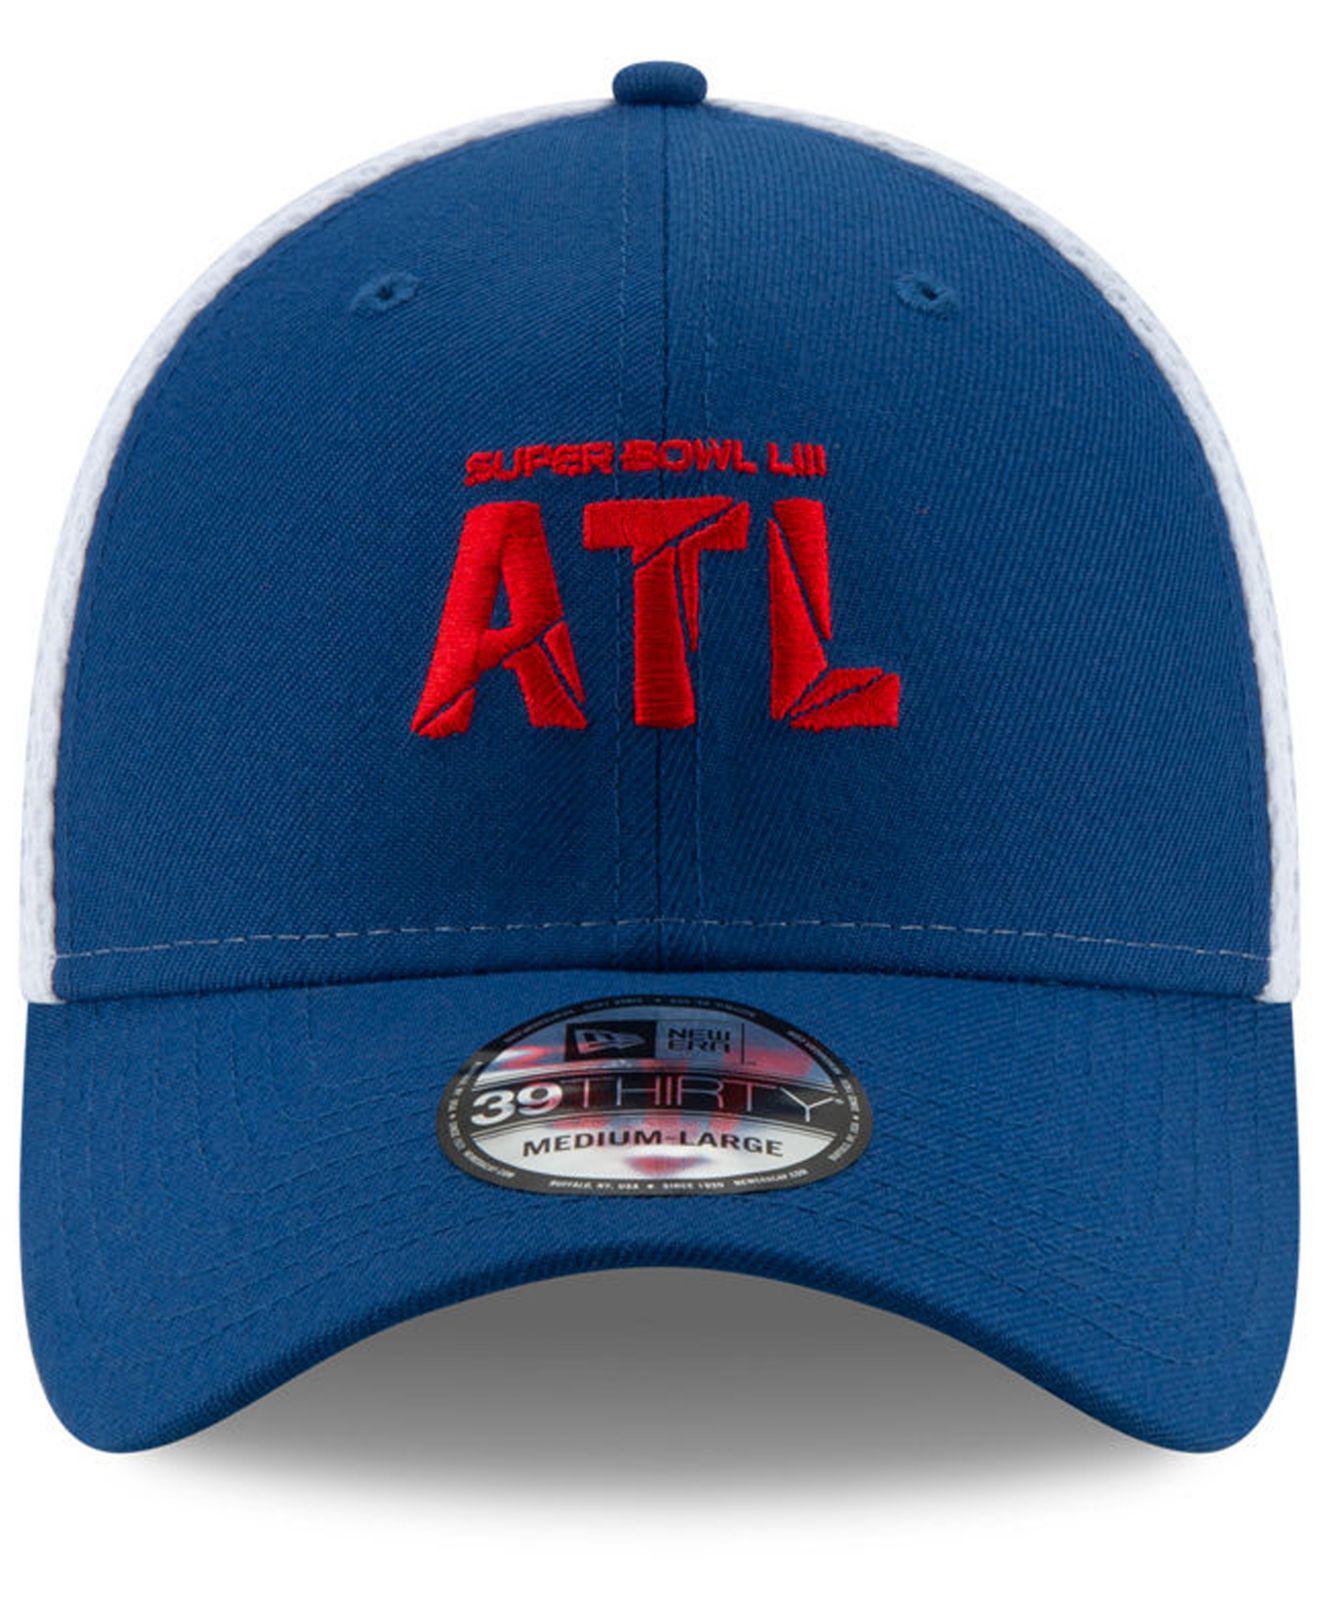 reputable site 550d9 fef11 Lyst - Ktz Super Bowl Liii Atlanta Stretch Mesh 39thirty Stretch Fitted Cap  in Blue for Men